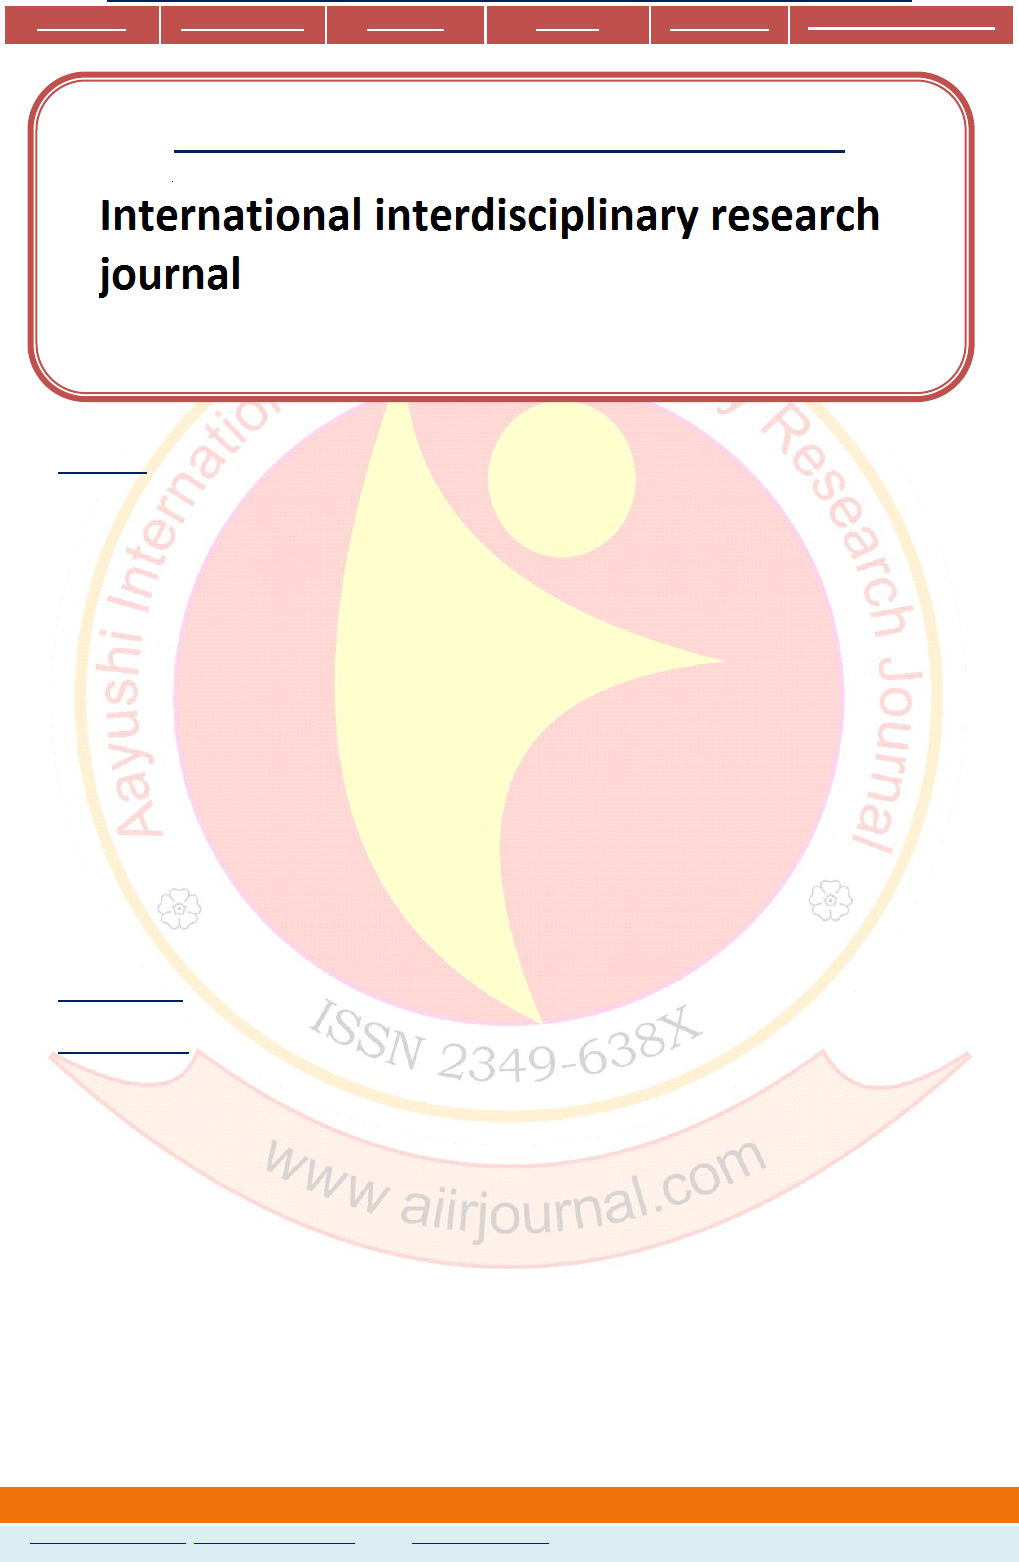 International interdisciplinary research journal